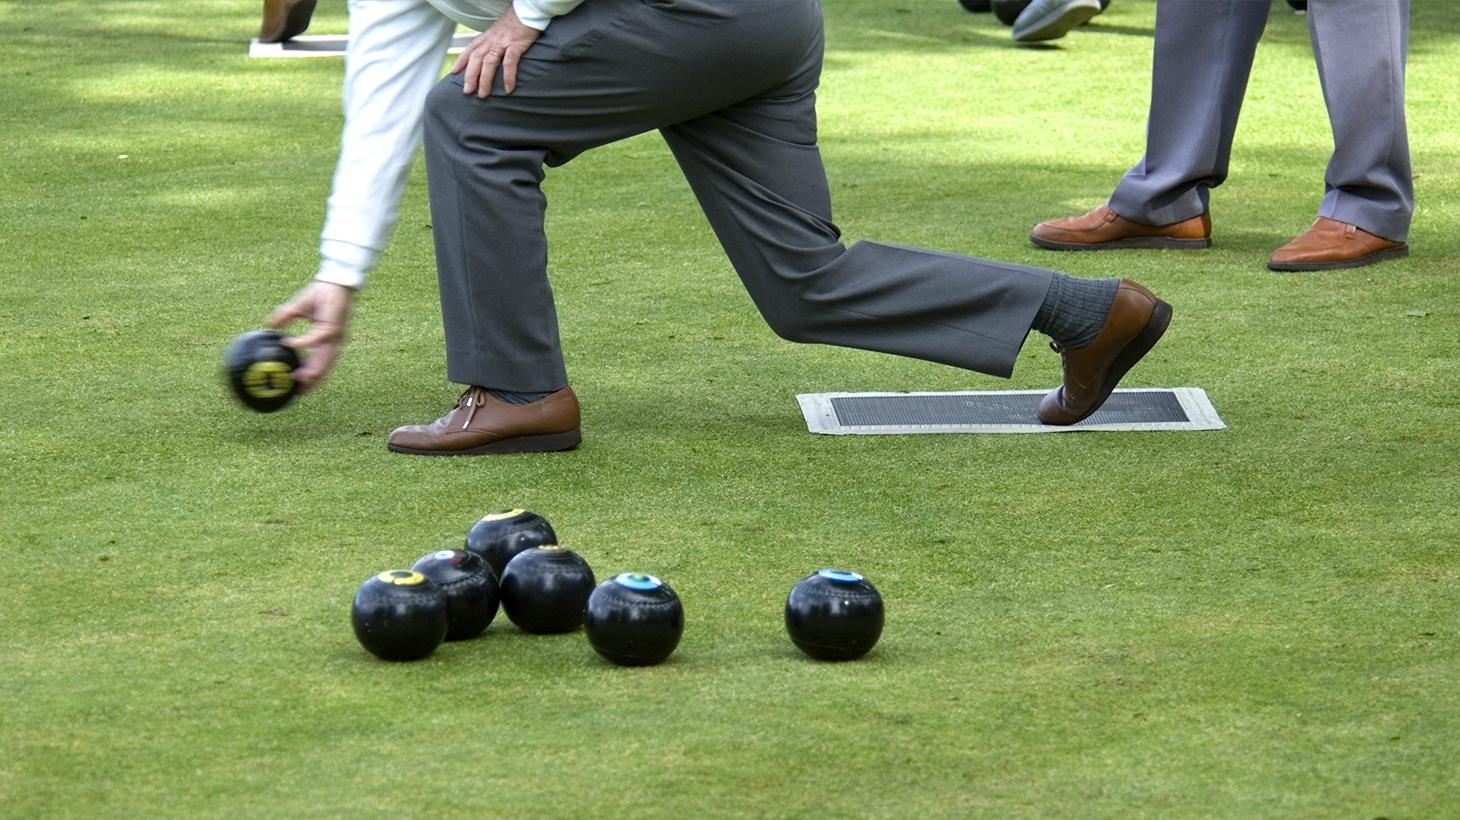 Closeup of man playing lawn bowling